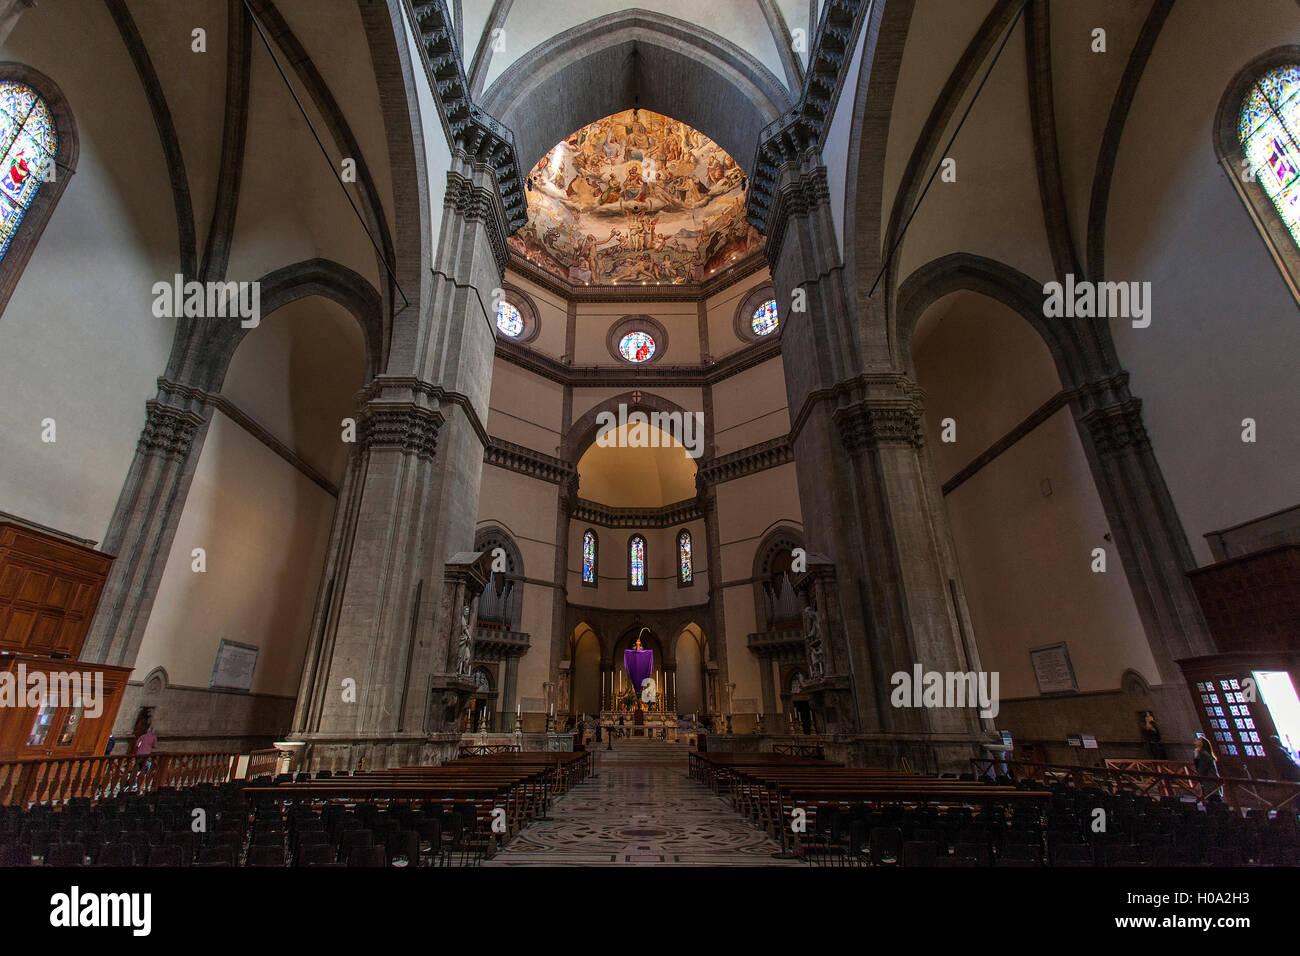 La Catedral de Santa Maria del Fiore, del Interior, de Florencia, Toscana, Italia Foto de stock